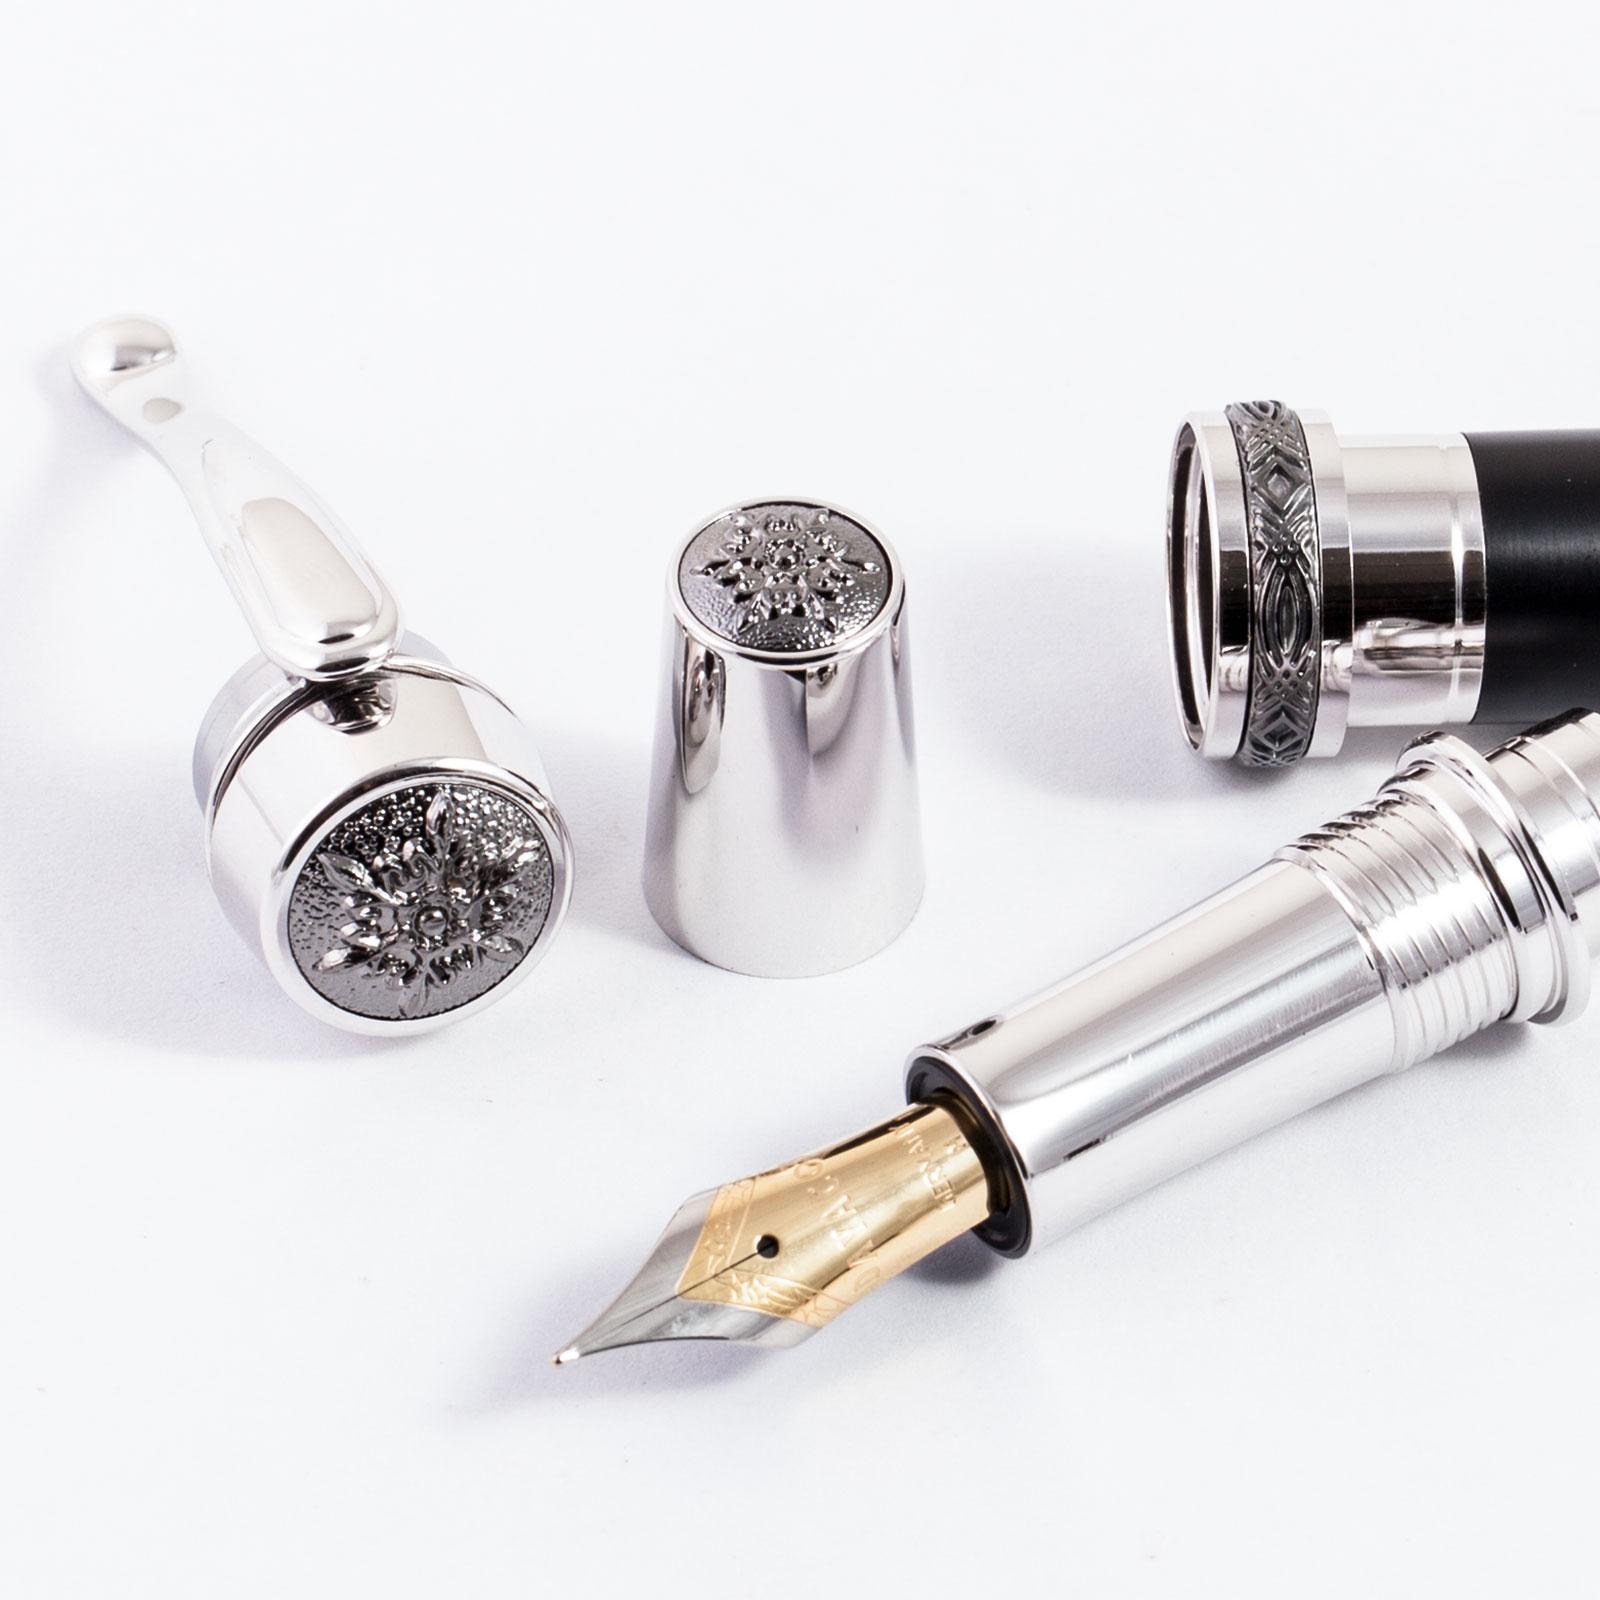 mechanik-fuellfederhalter-statesman-rhodium-black-titanium